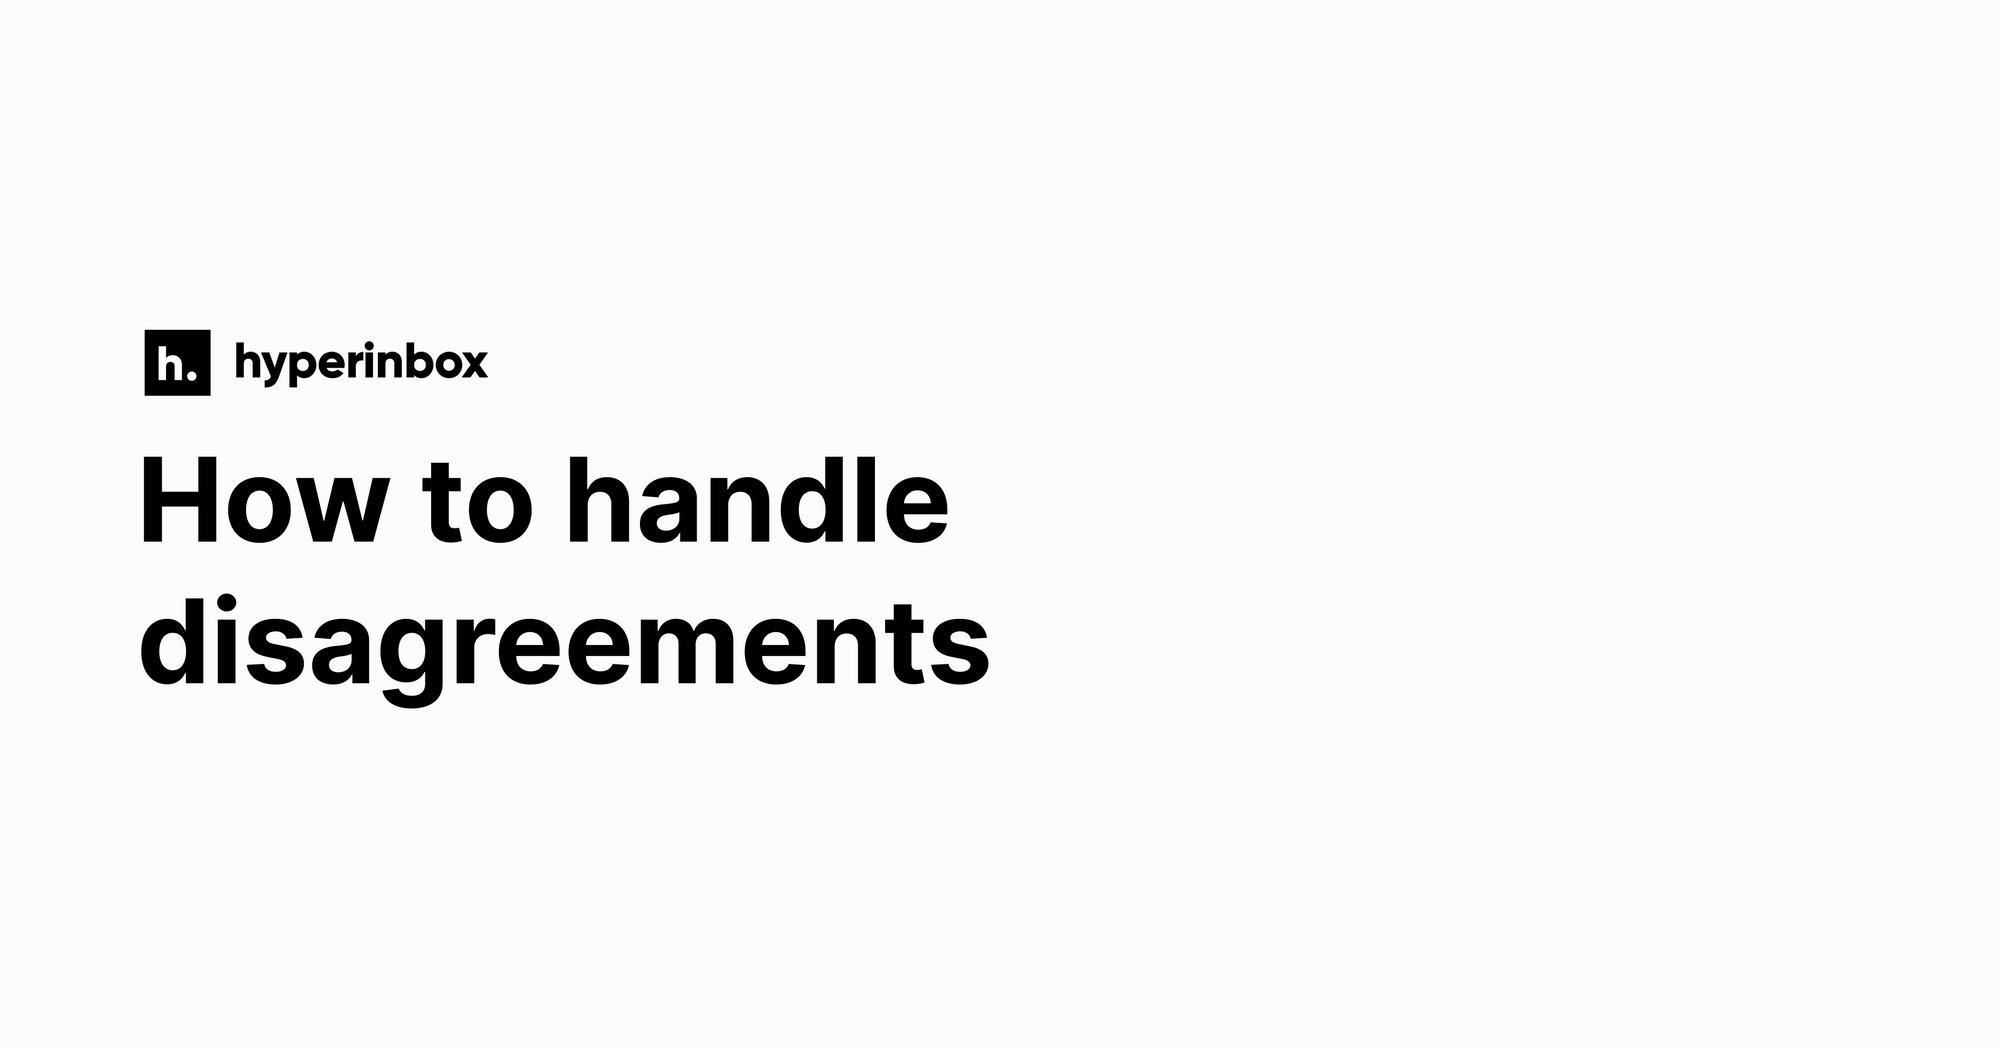 How to handle disagreements